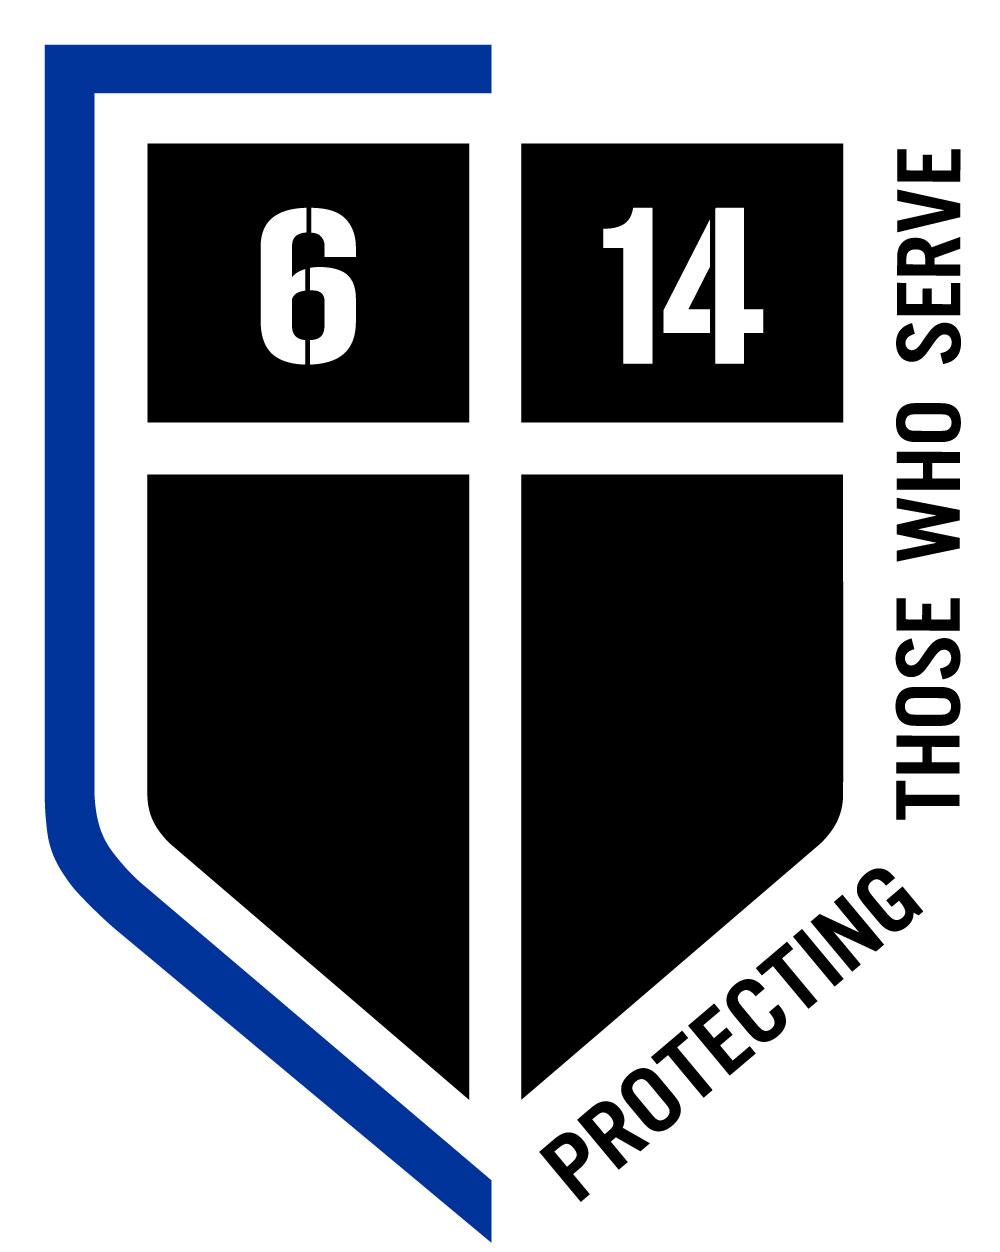 E614-FINAL-ProtectingJPEG.jpg